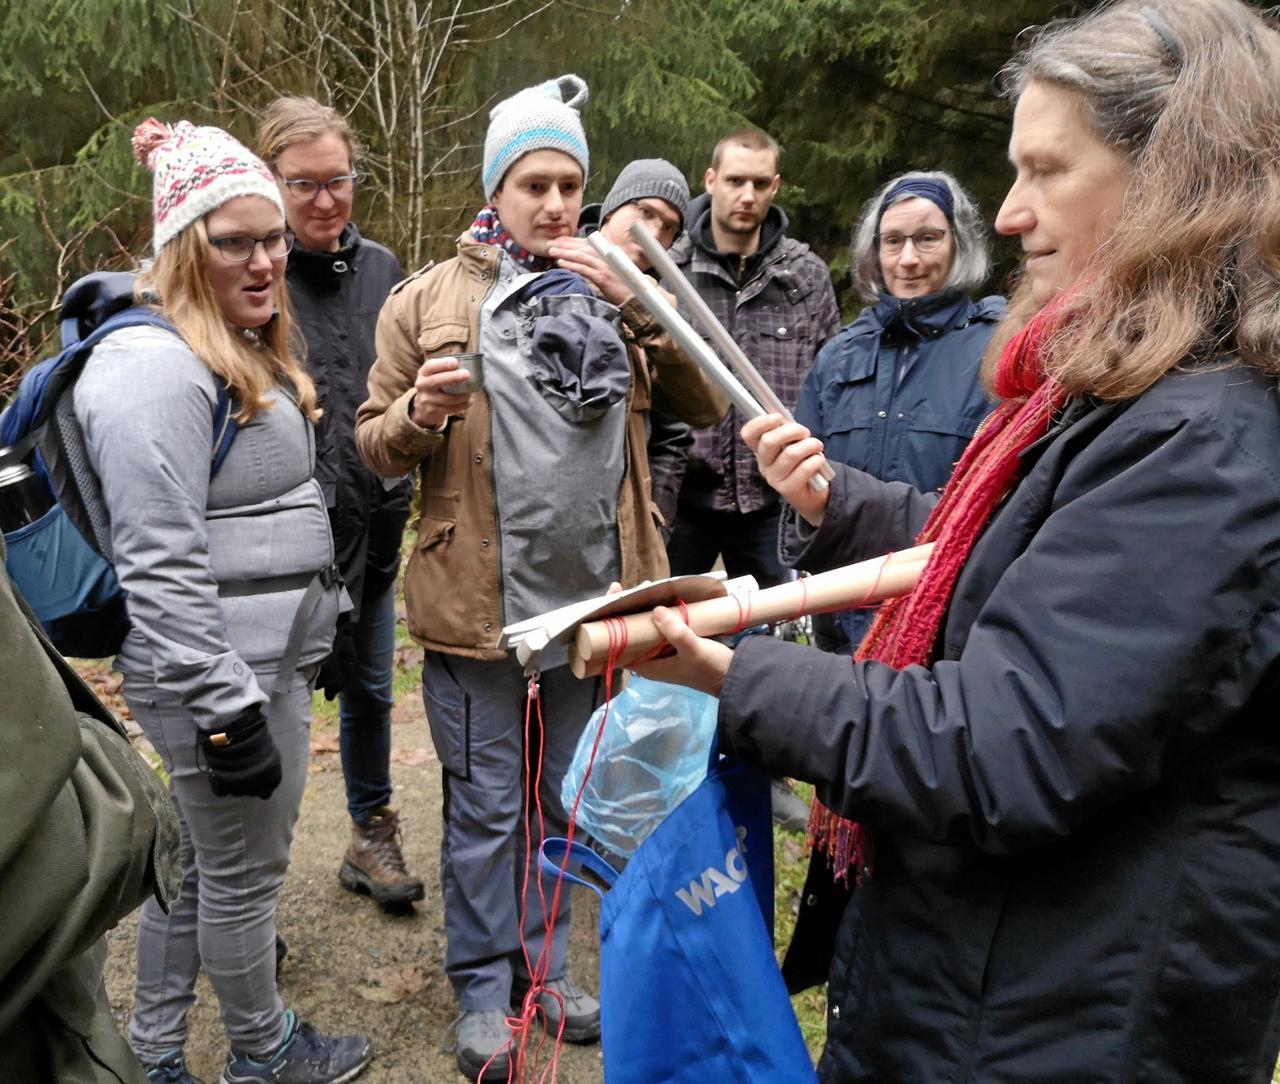 14 Teilnehmer beim Studentenwerk-Wandertag | Clausthal-Zellerfeld - GZ Live